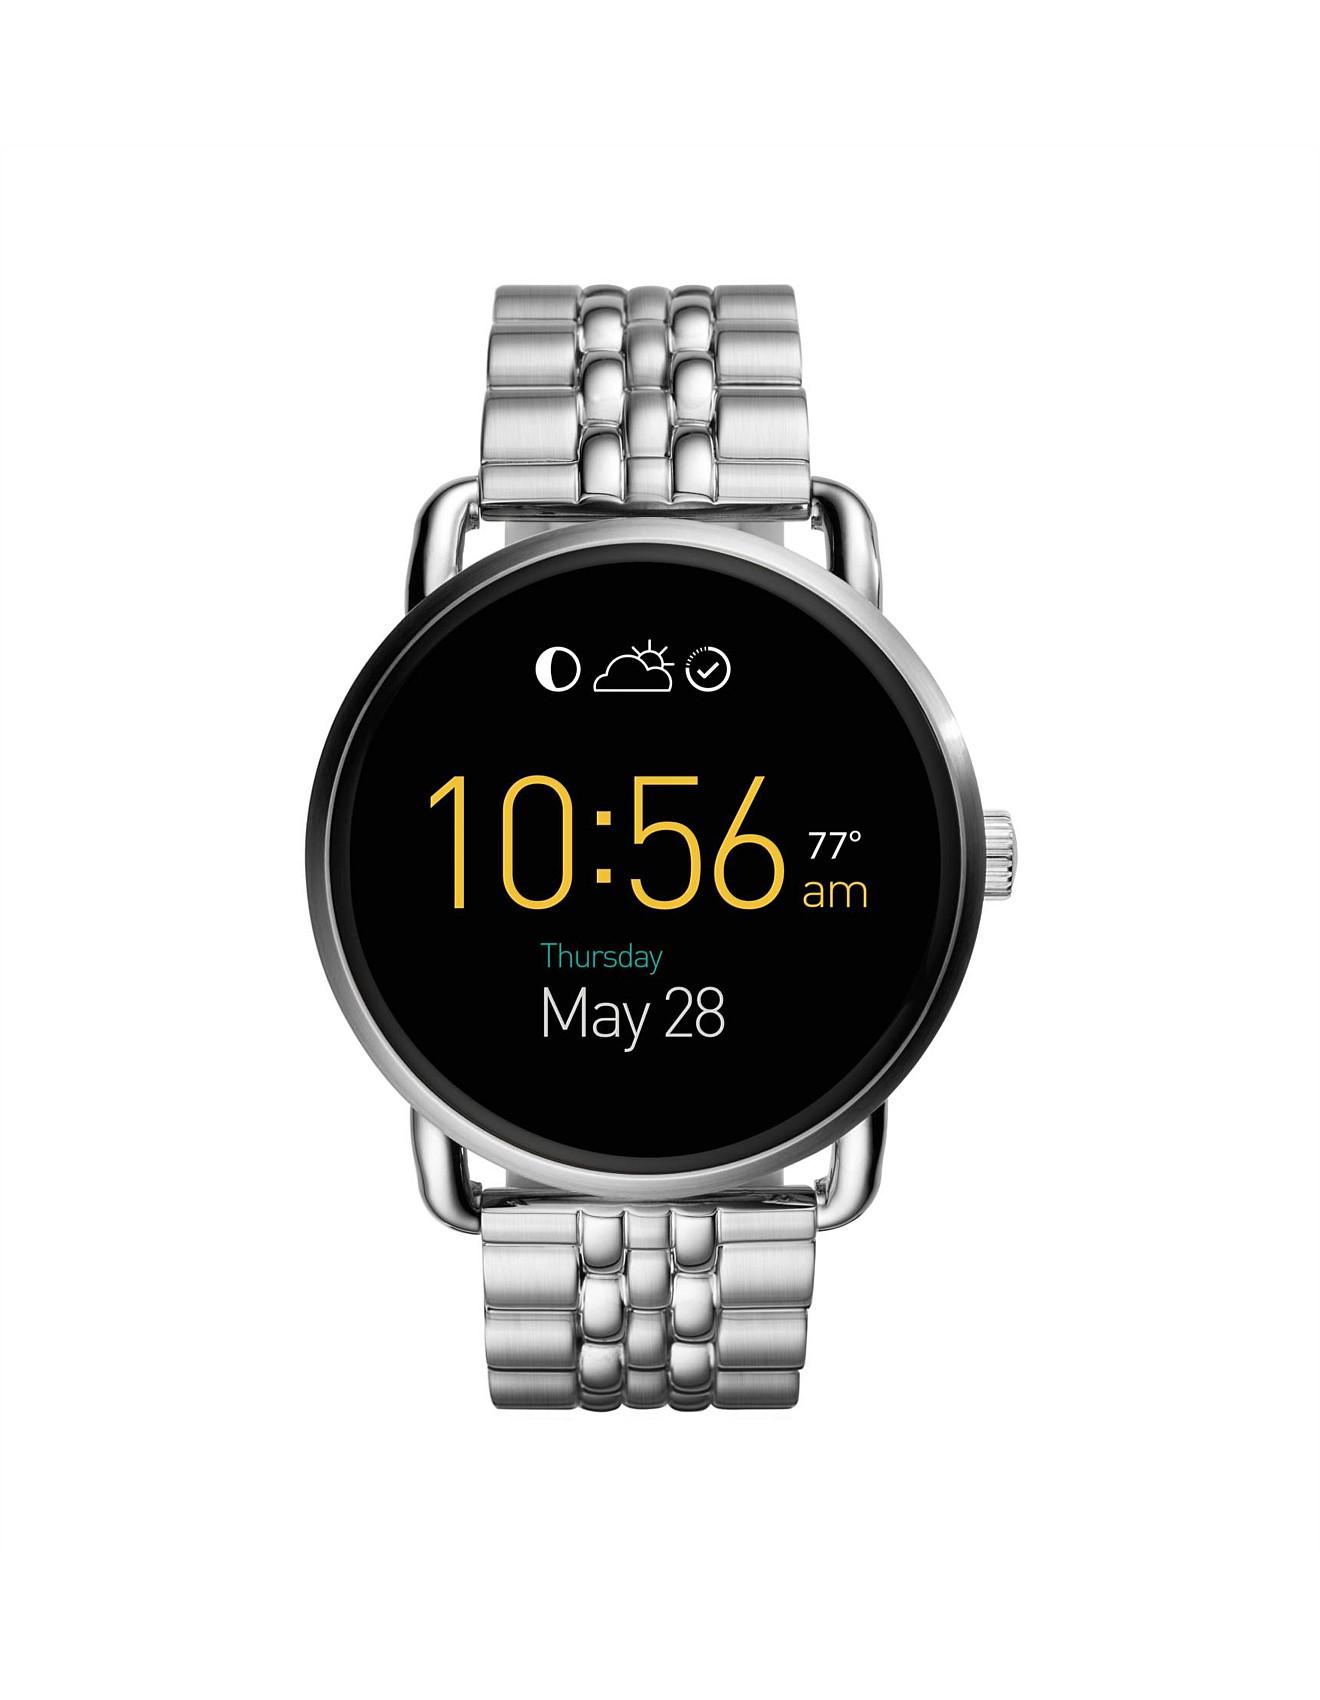 823ee77d2784 Q Wander Touchscreen Stainless Steel Smartwatch